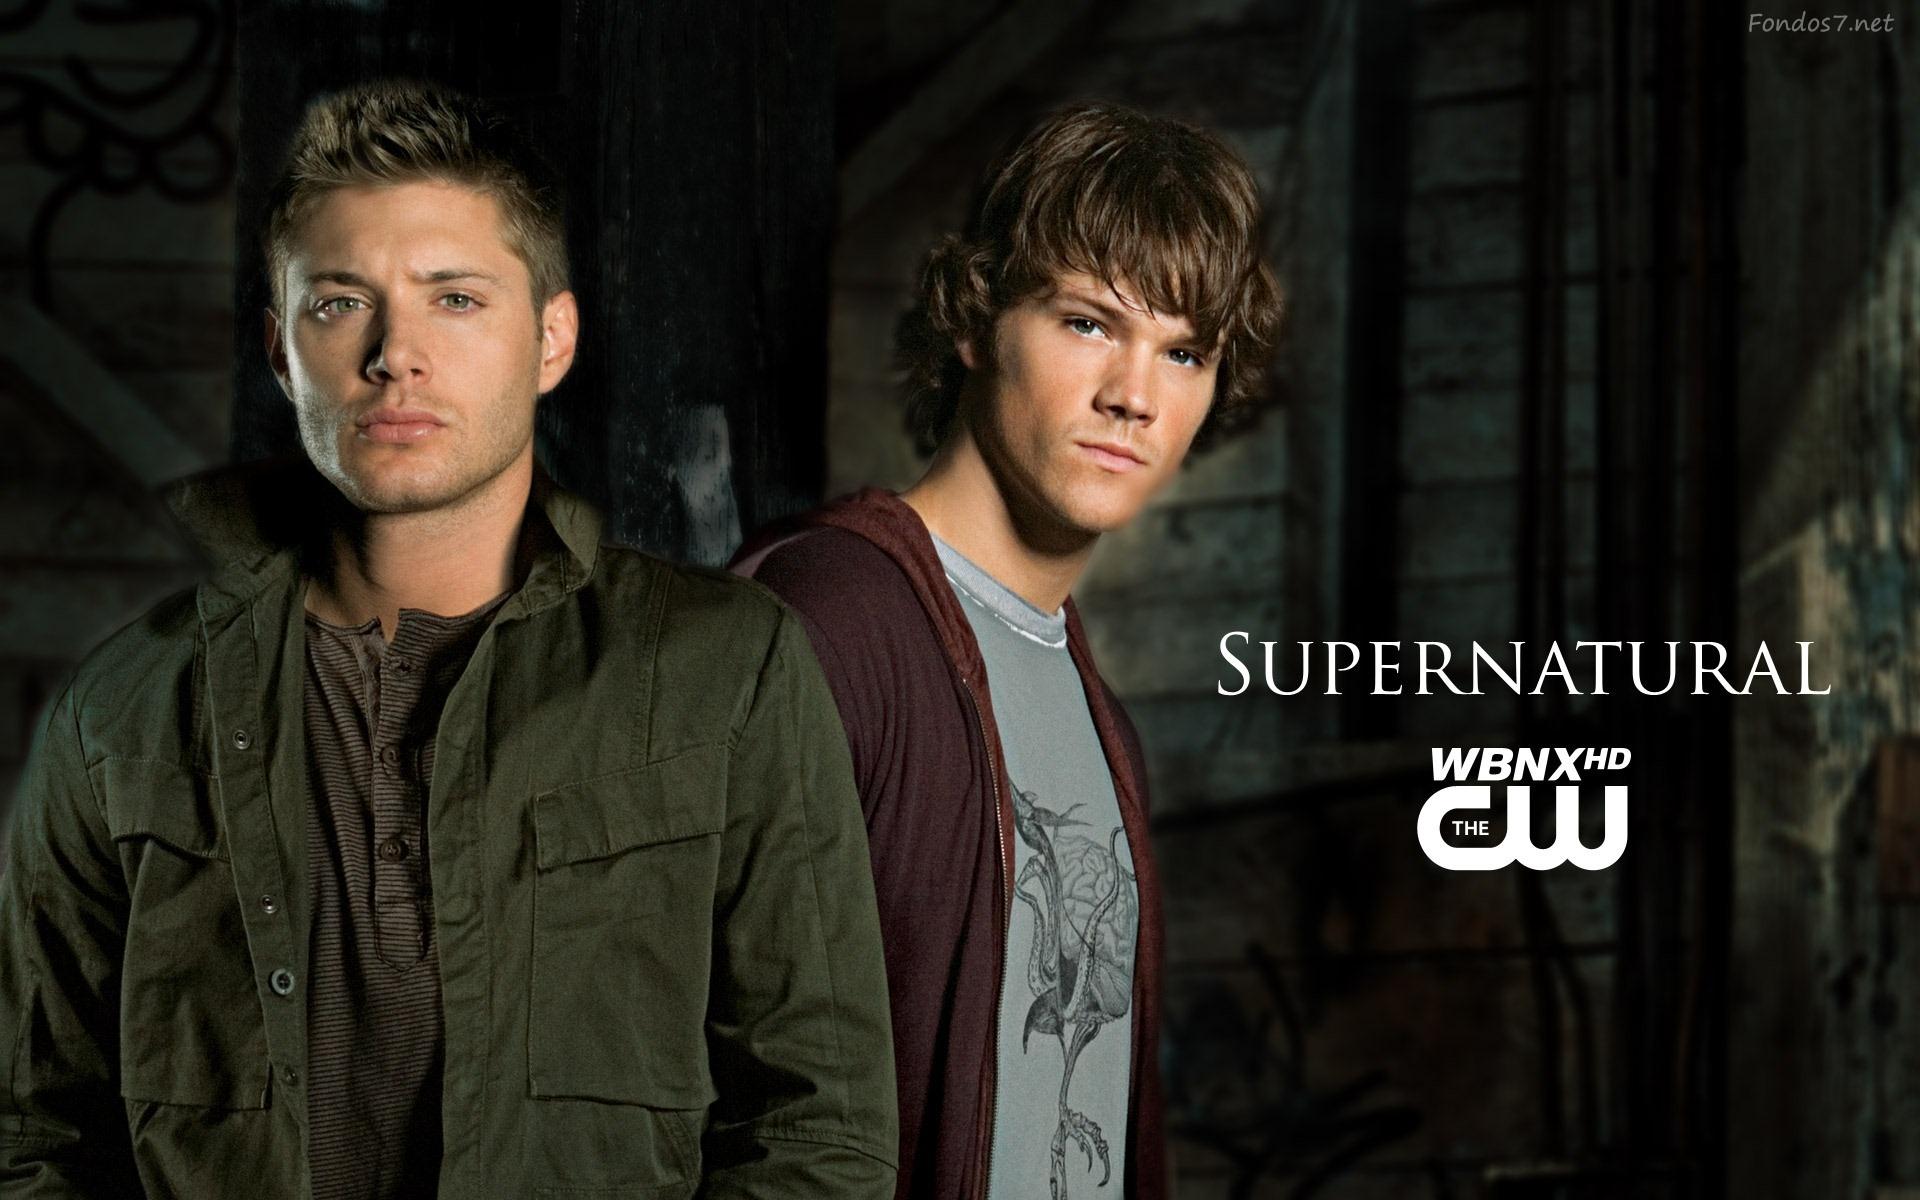 Dean Y Sam Supernatural Hd Desktop Picture Avance